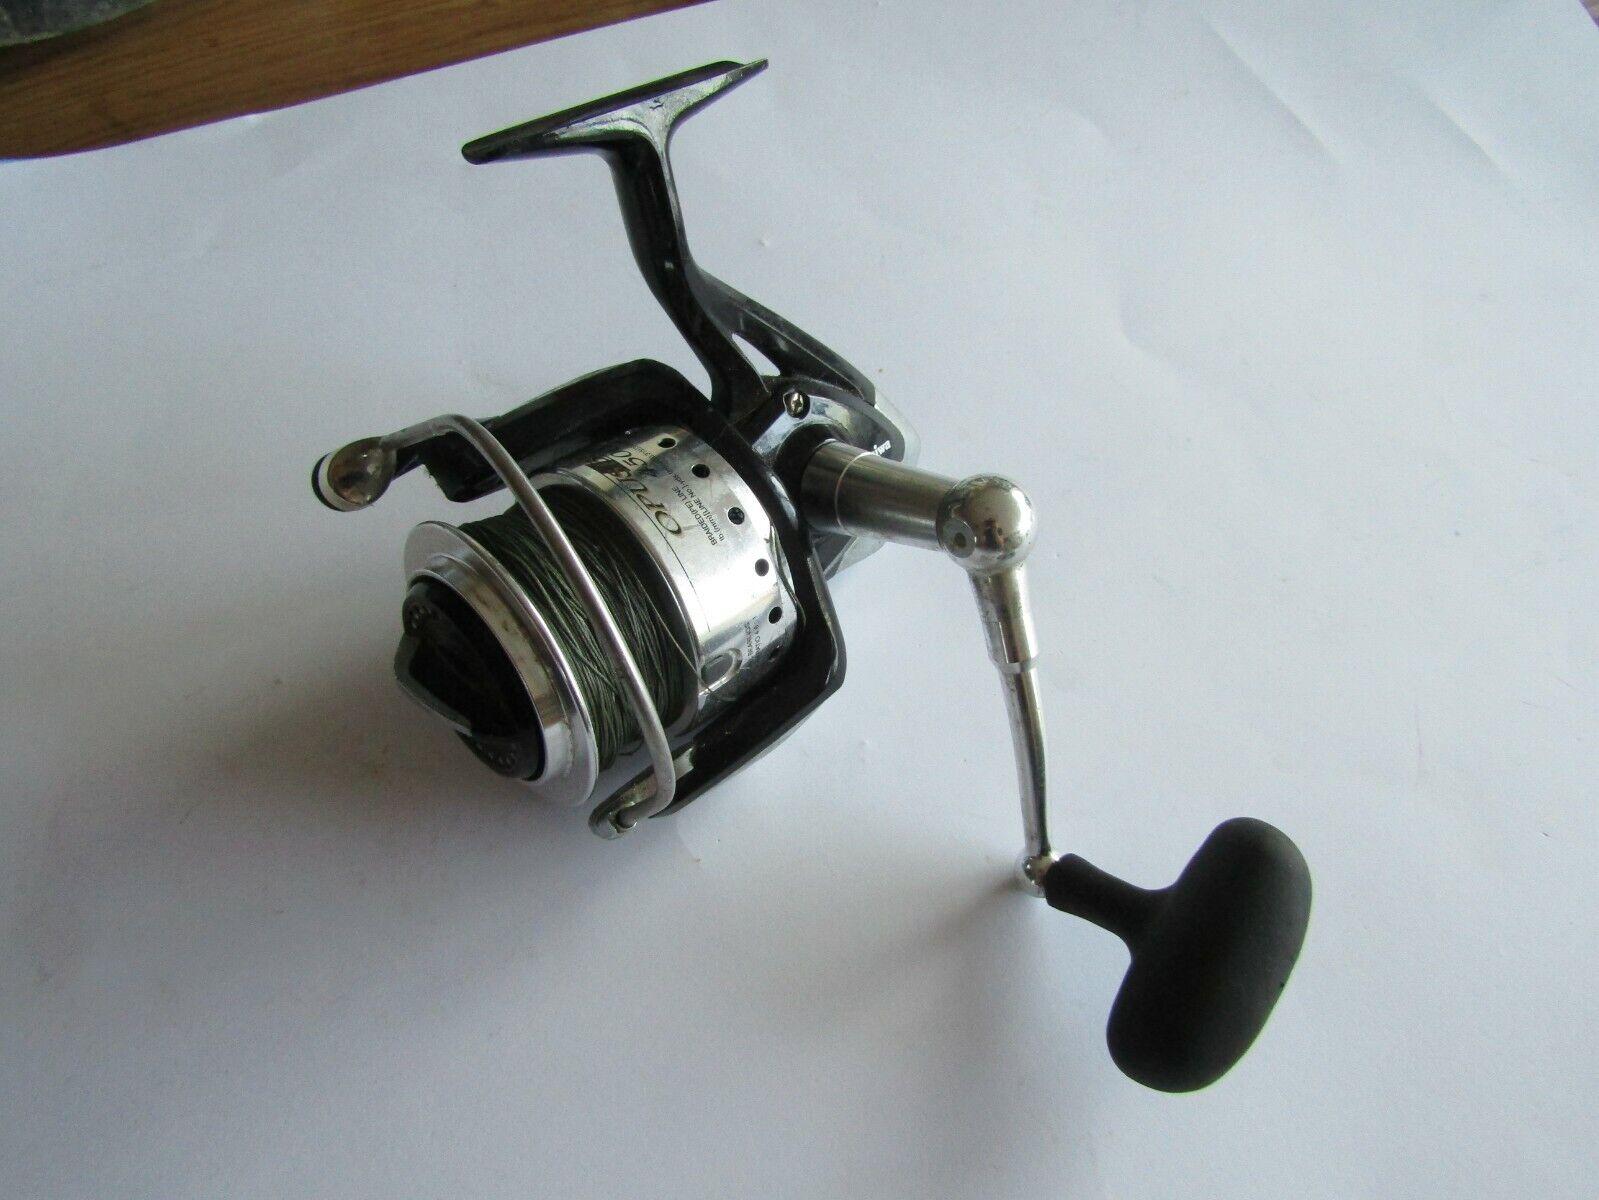 MOULINET  DAIWA OPUS BULL 4500 pêche  sin mínimo